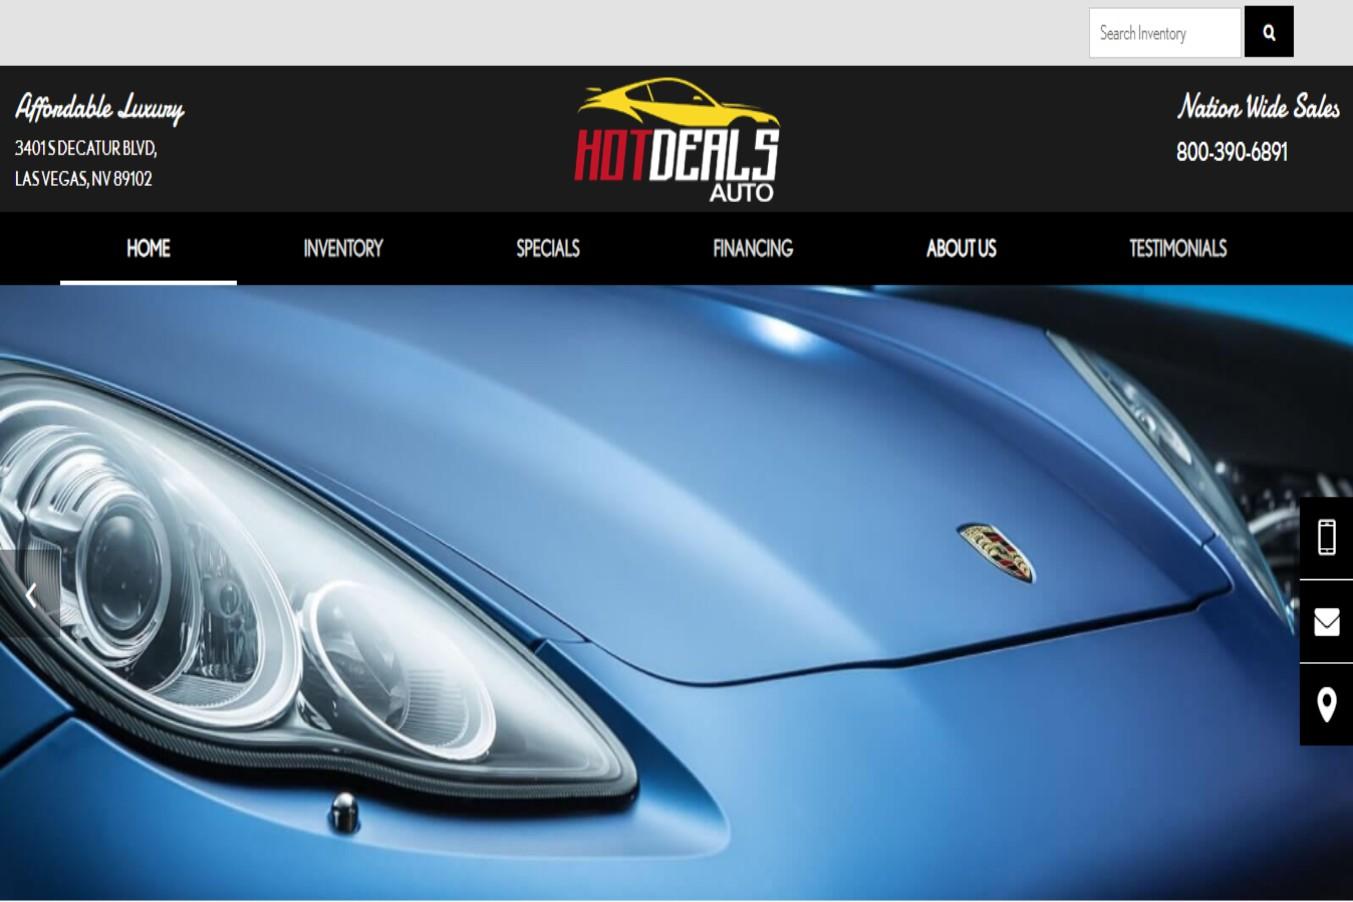 Hot Deals Best Car Dealerships in Las Vegas, NV